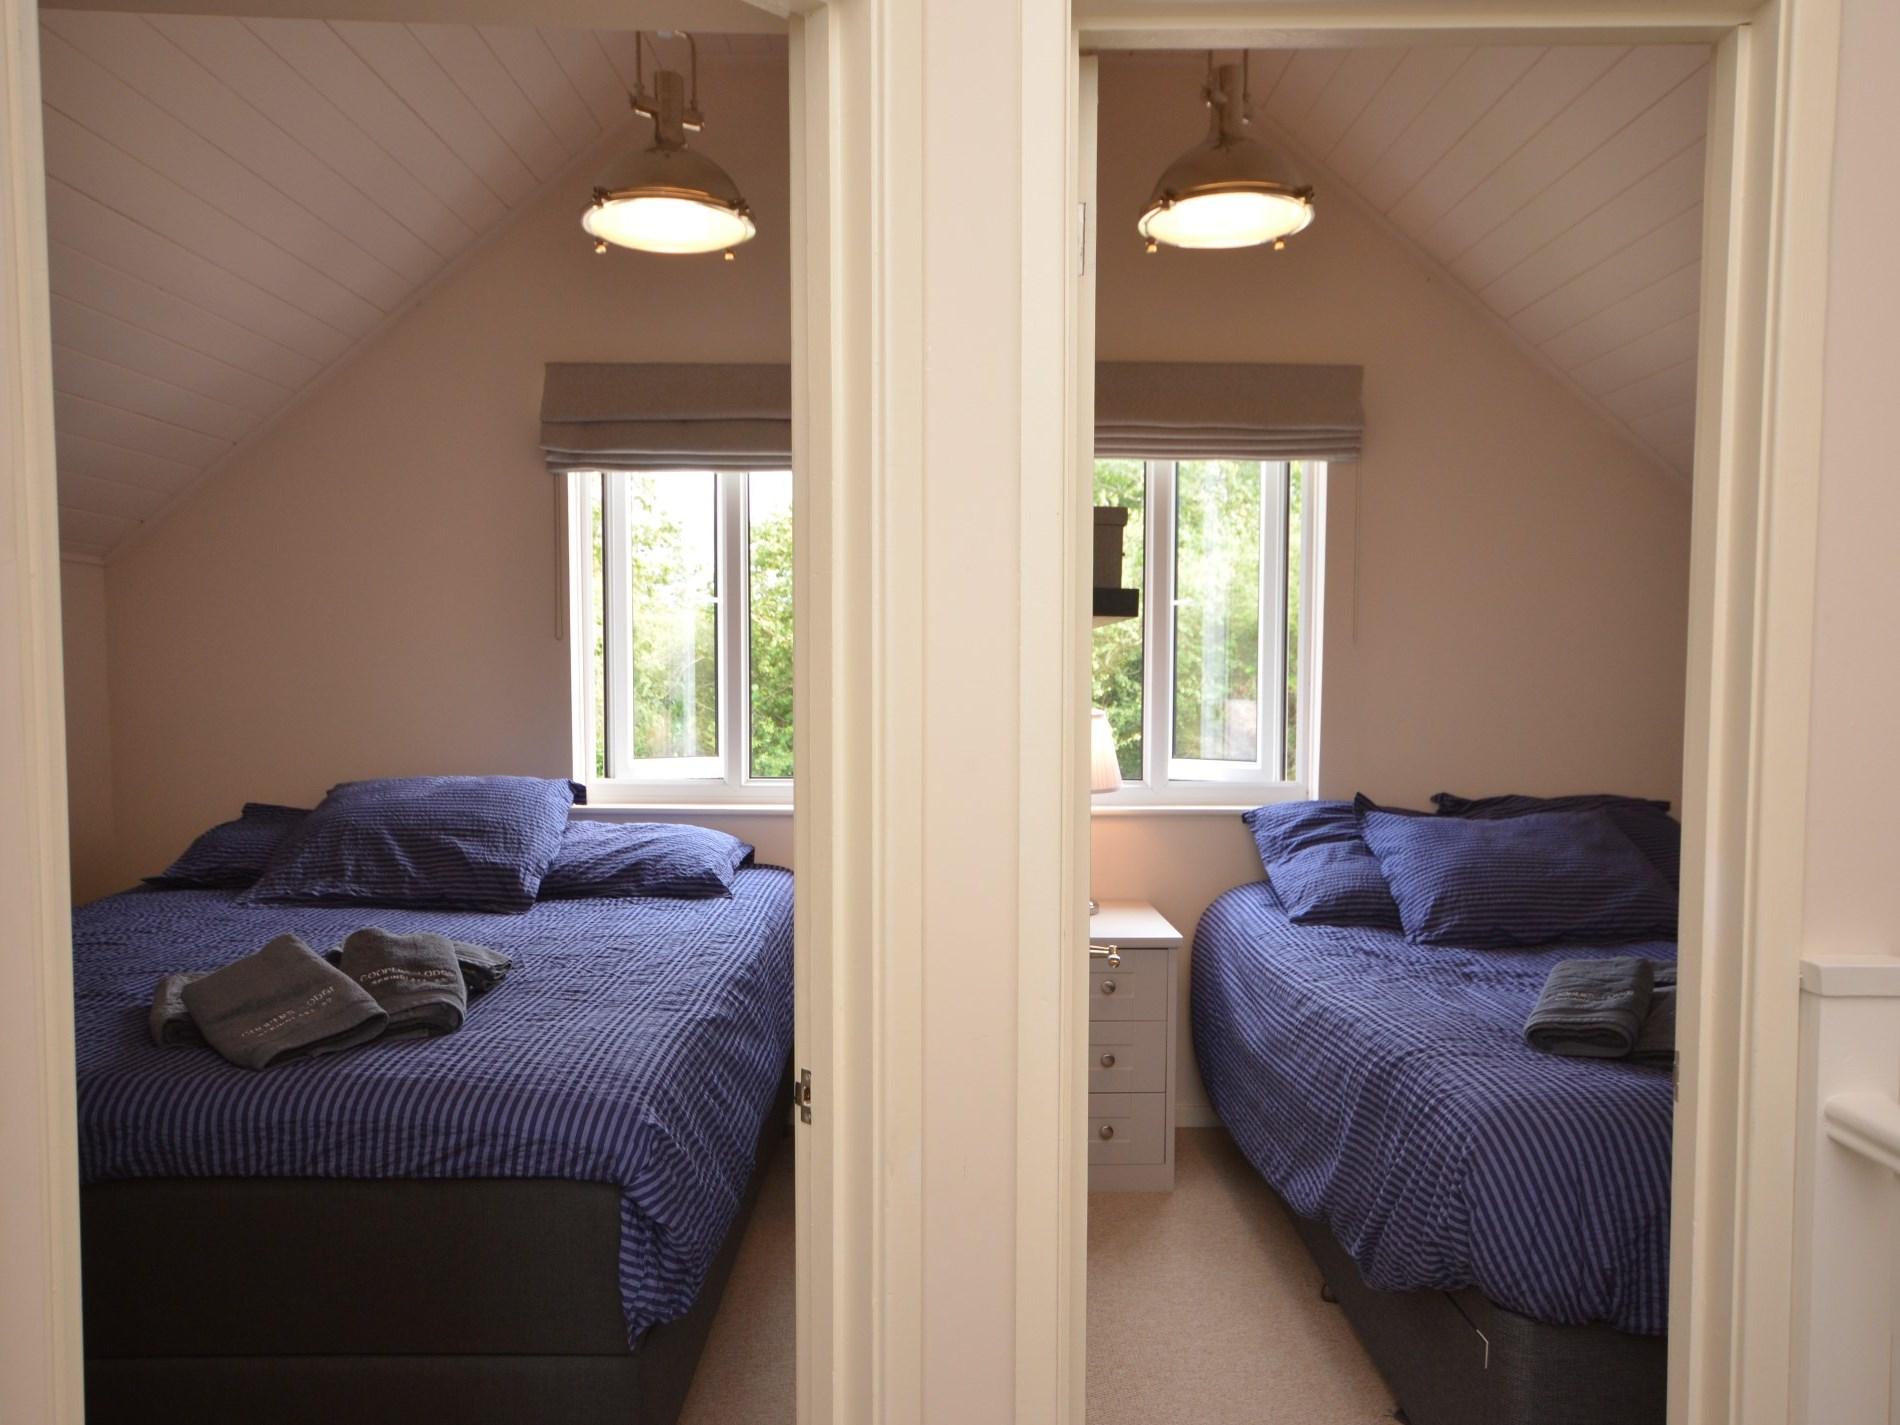 2 comfortable double bedrooms